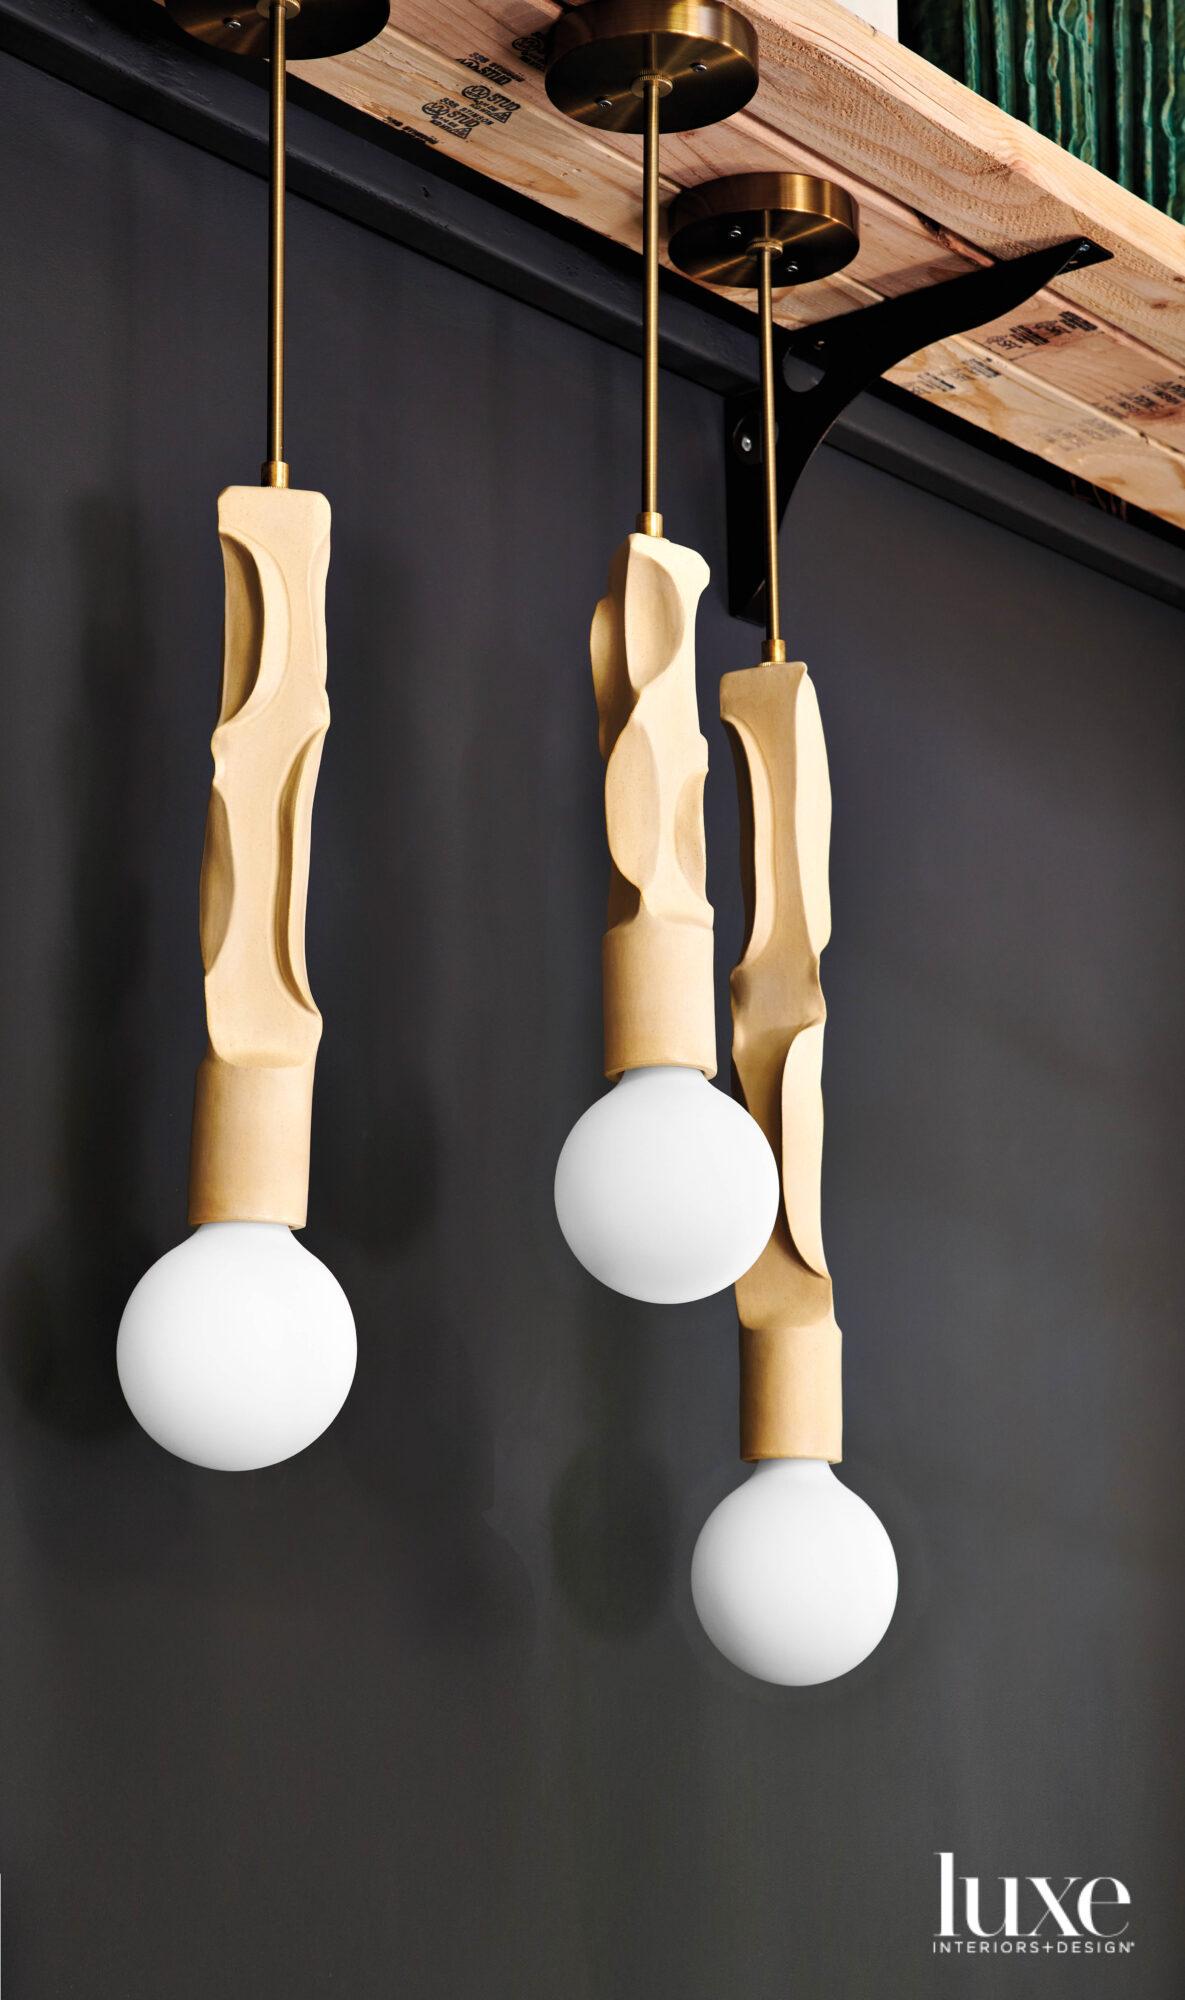 Three hanging pendant lights